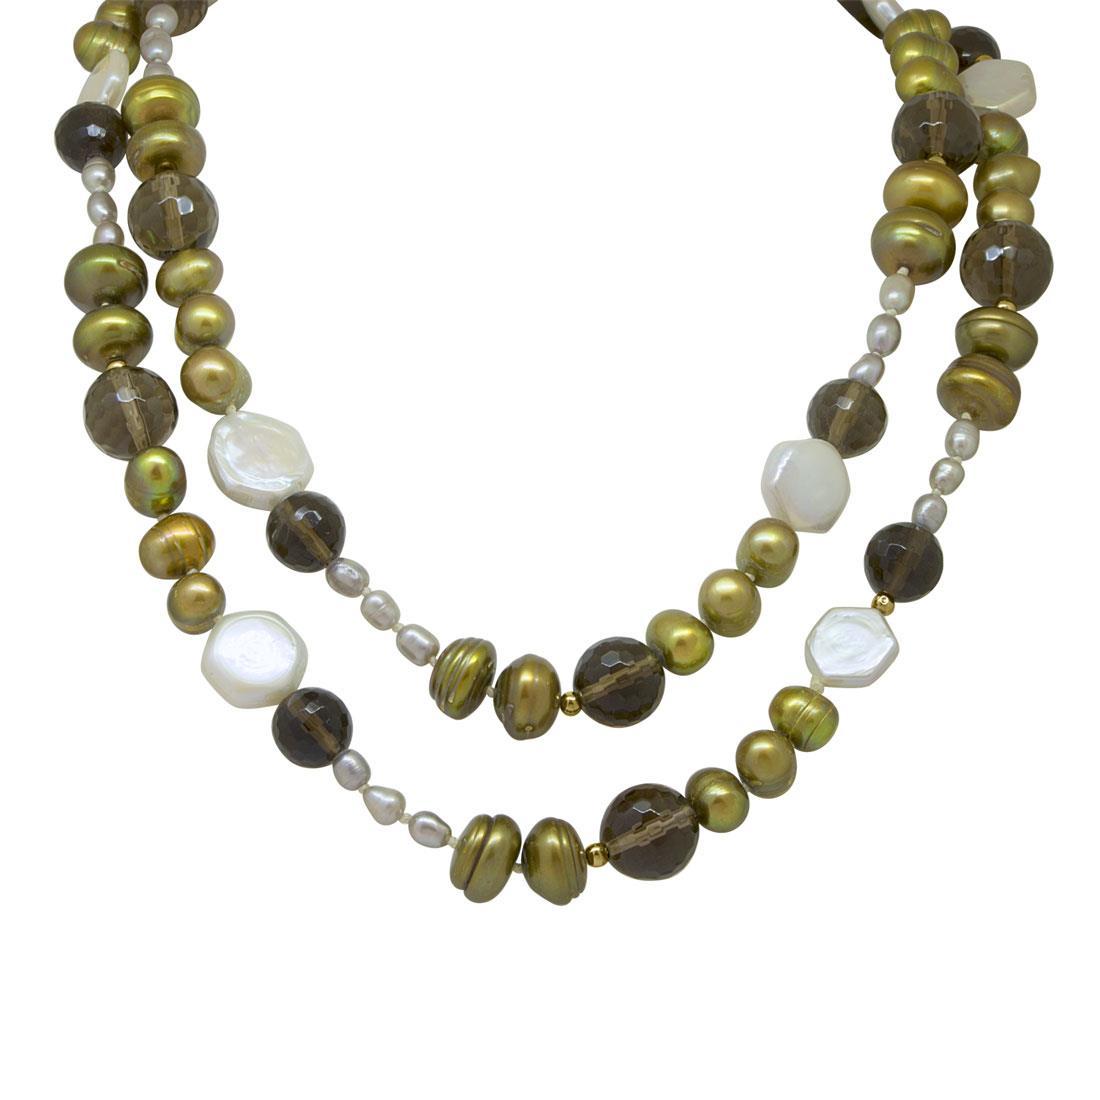 Collana in argento con perle - RIVIK